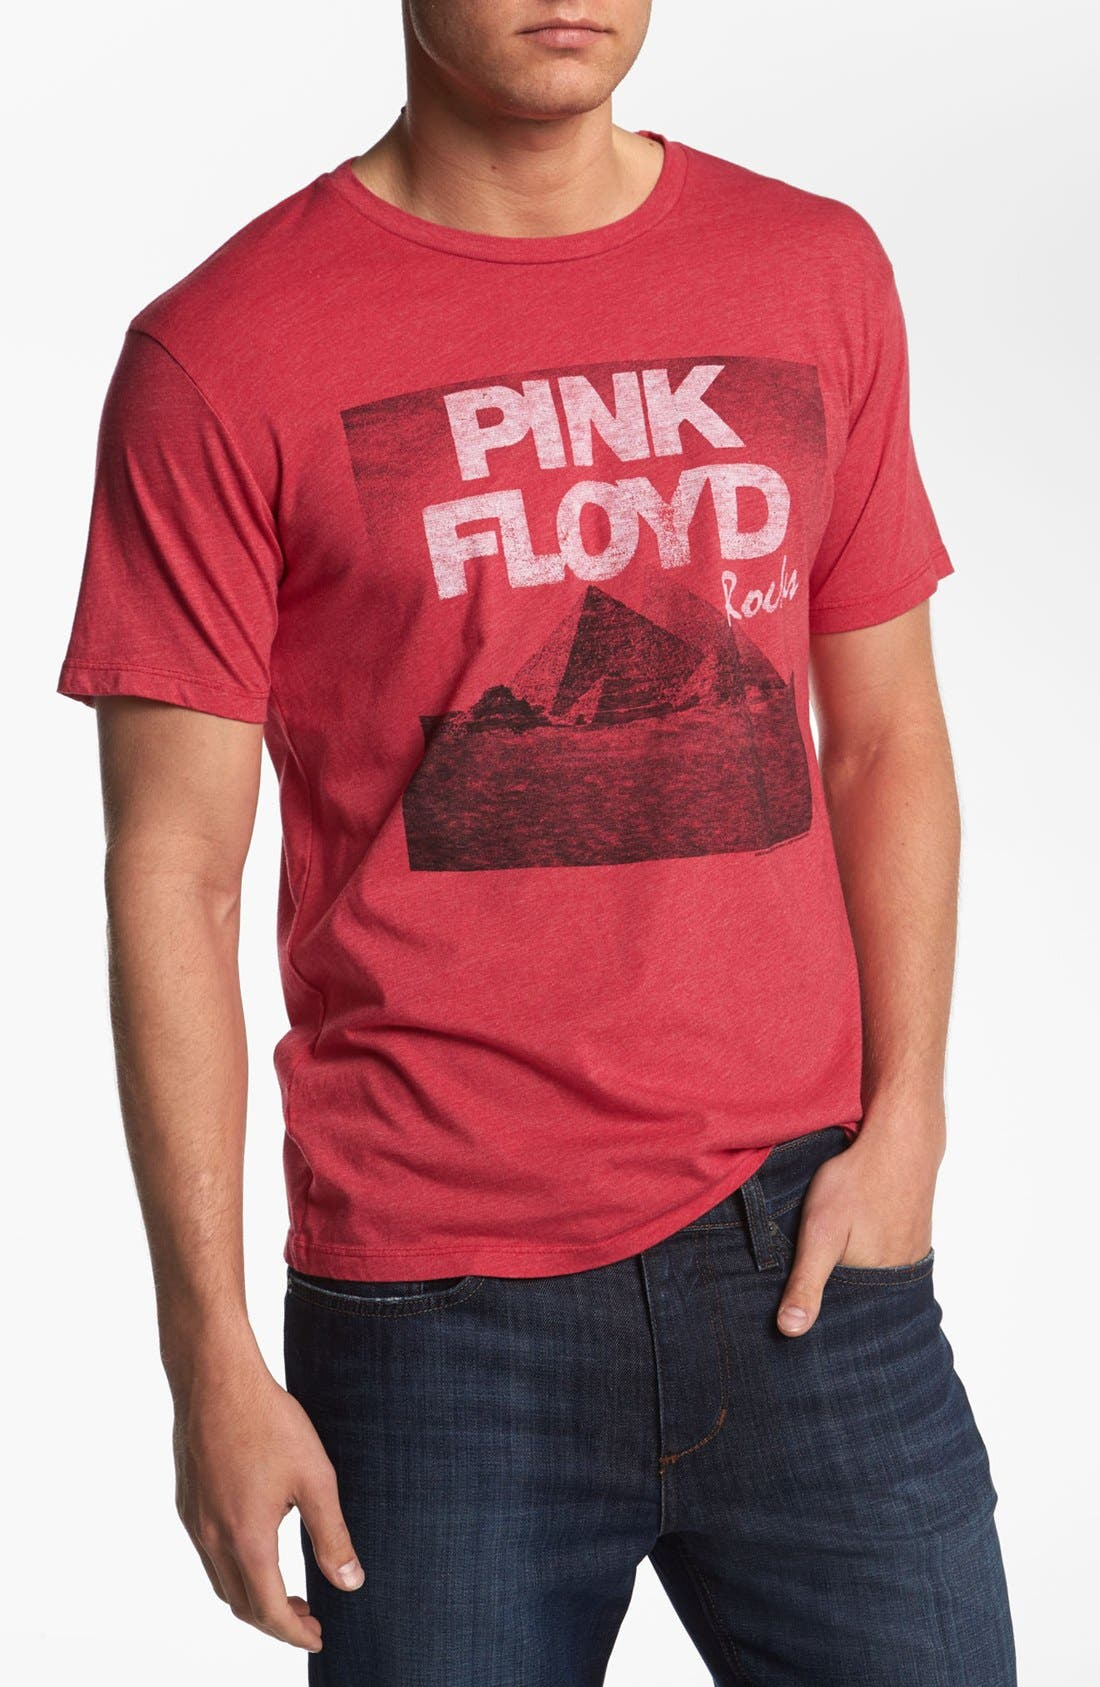 Main Image - Junk Food 'Pink Floyd' T-Shirt